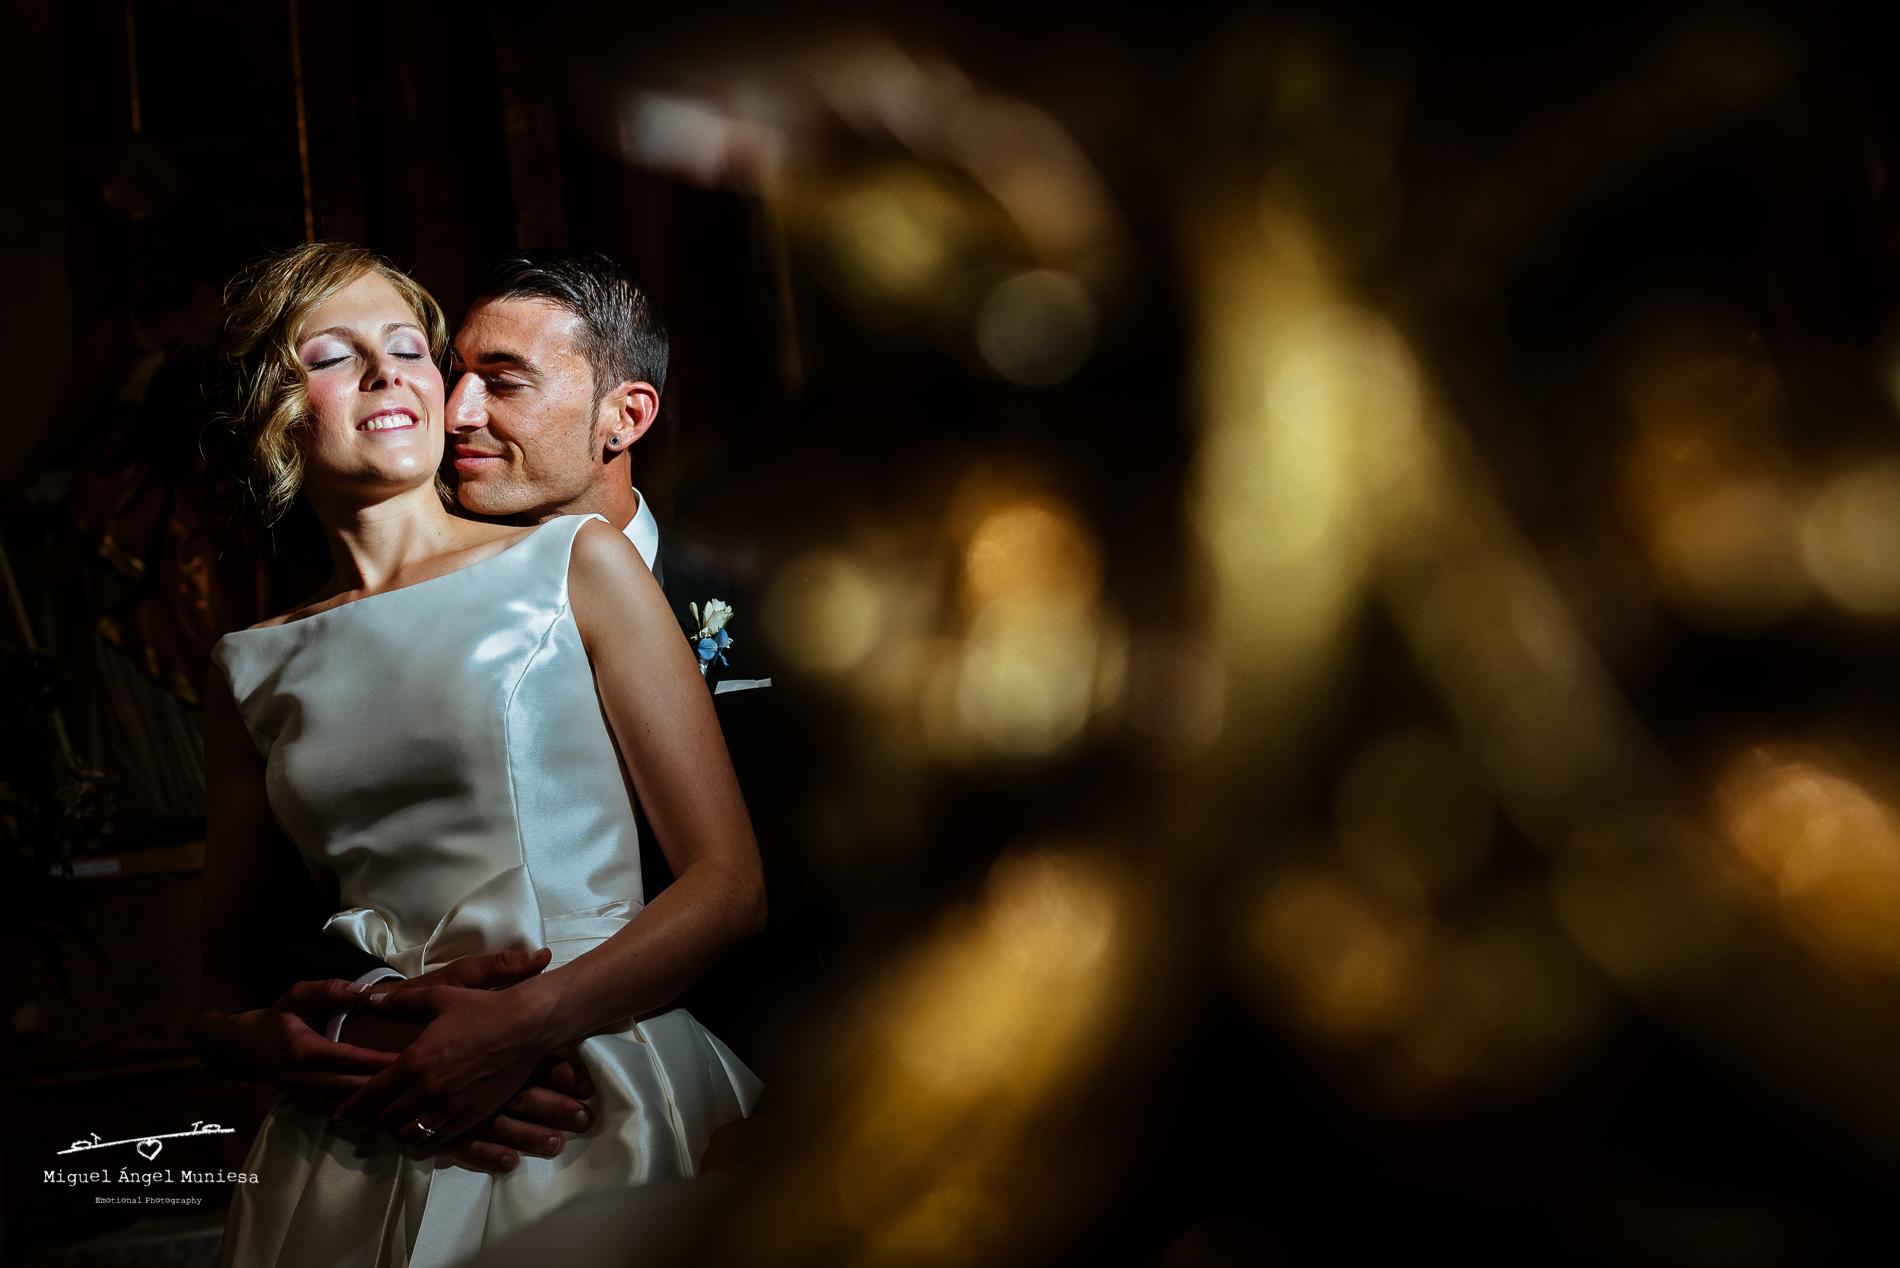 boda, fotografia de boda, boda zaragoza, fotografia, wedding, wedding photography, miguel angel muniesa, fotografo boda Zaragoza, fotografo boda, destination wedding_ 029